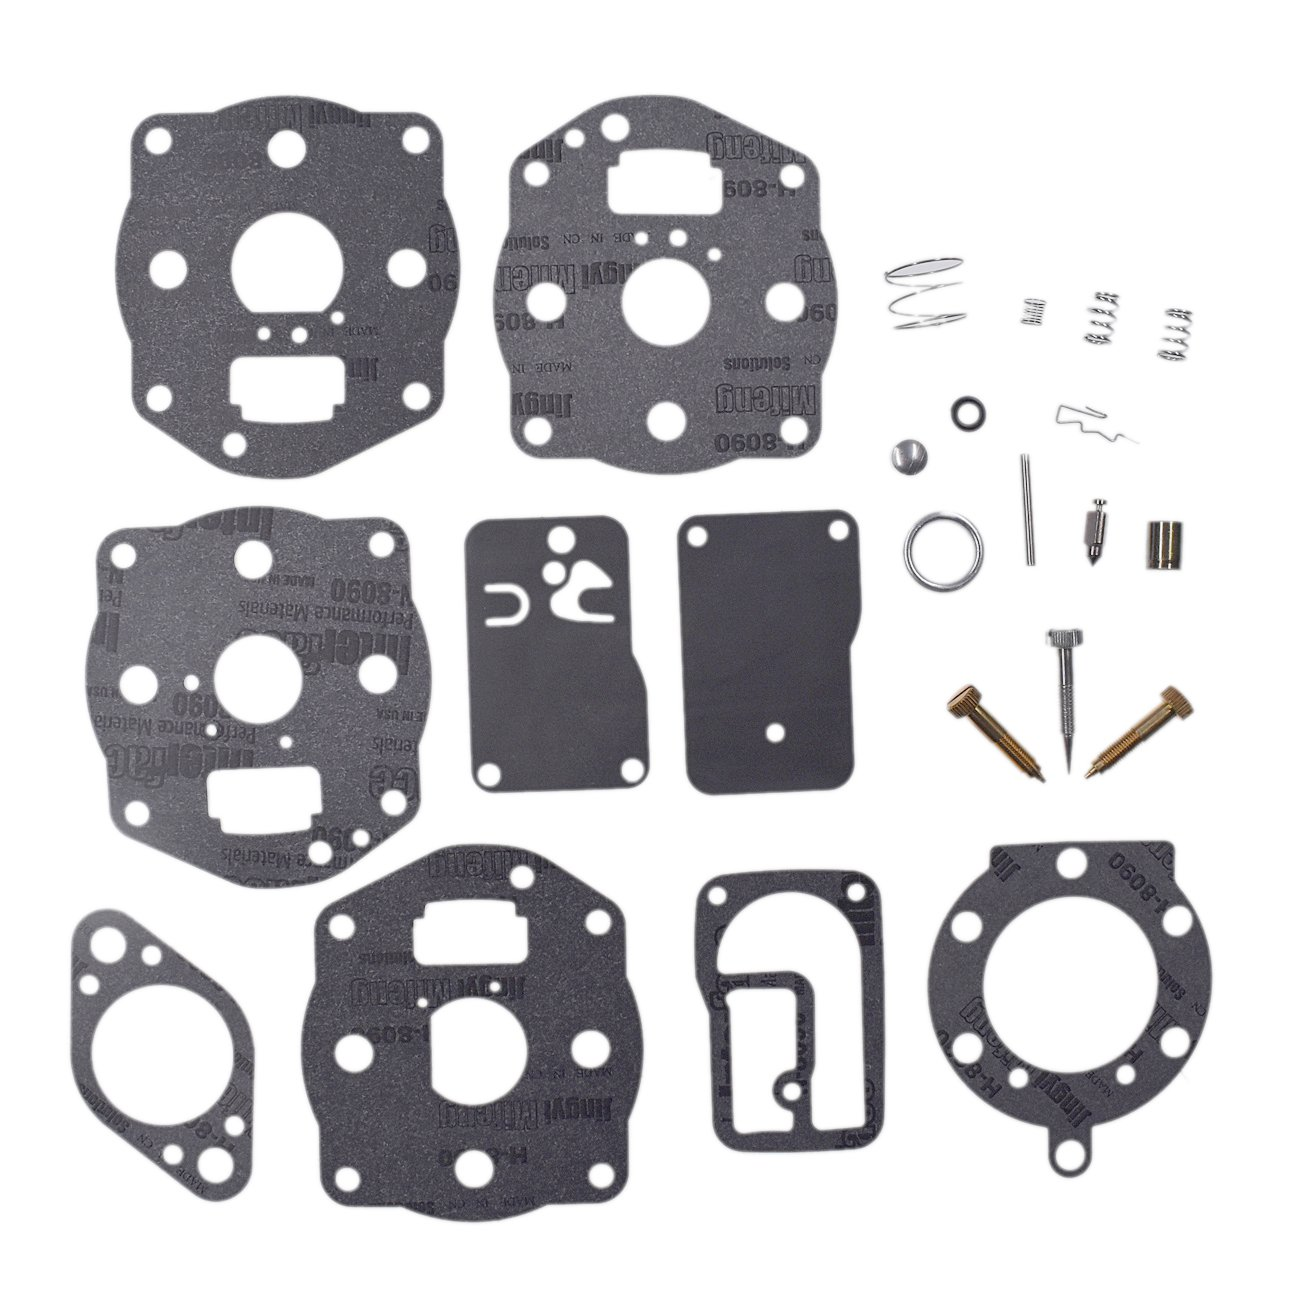 Carburetor Rebuild Kit For Briggs Stratton Models Engine Air Cleaner Parts Model 460707 42e707 42e777 Garden Outdoor